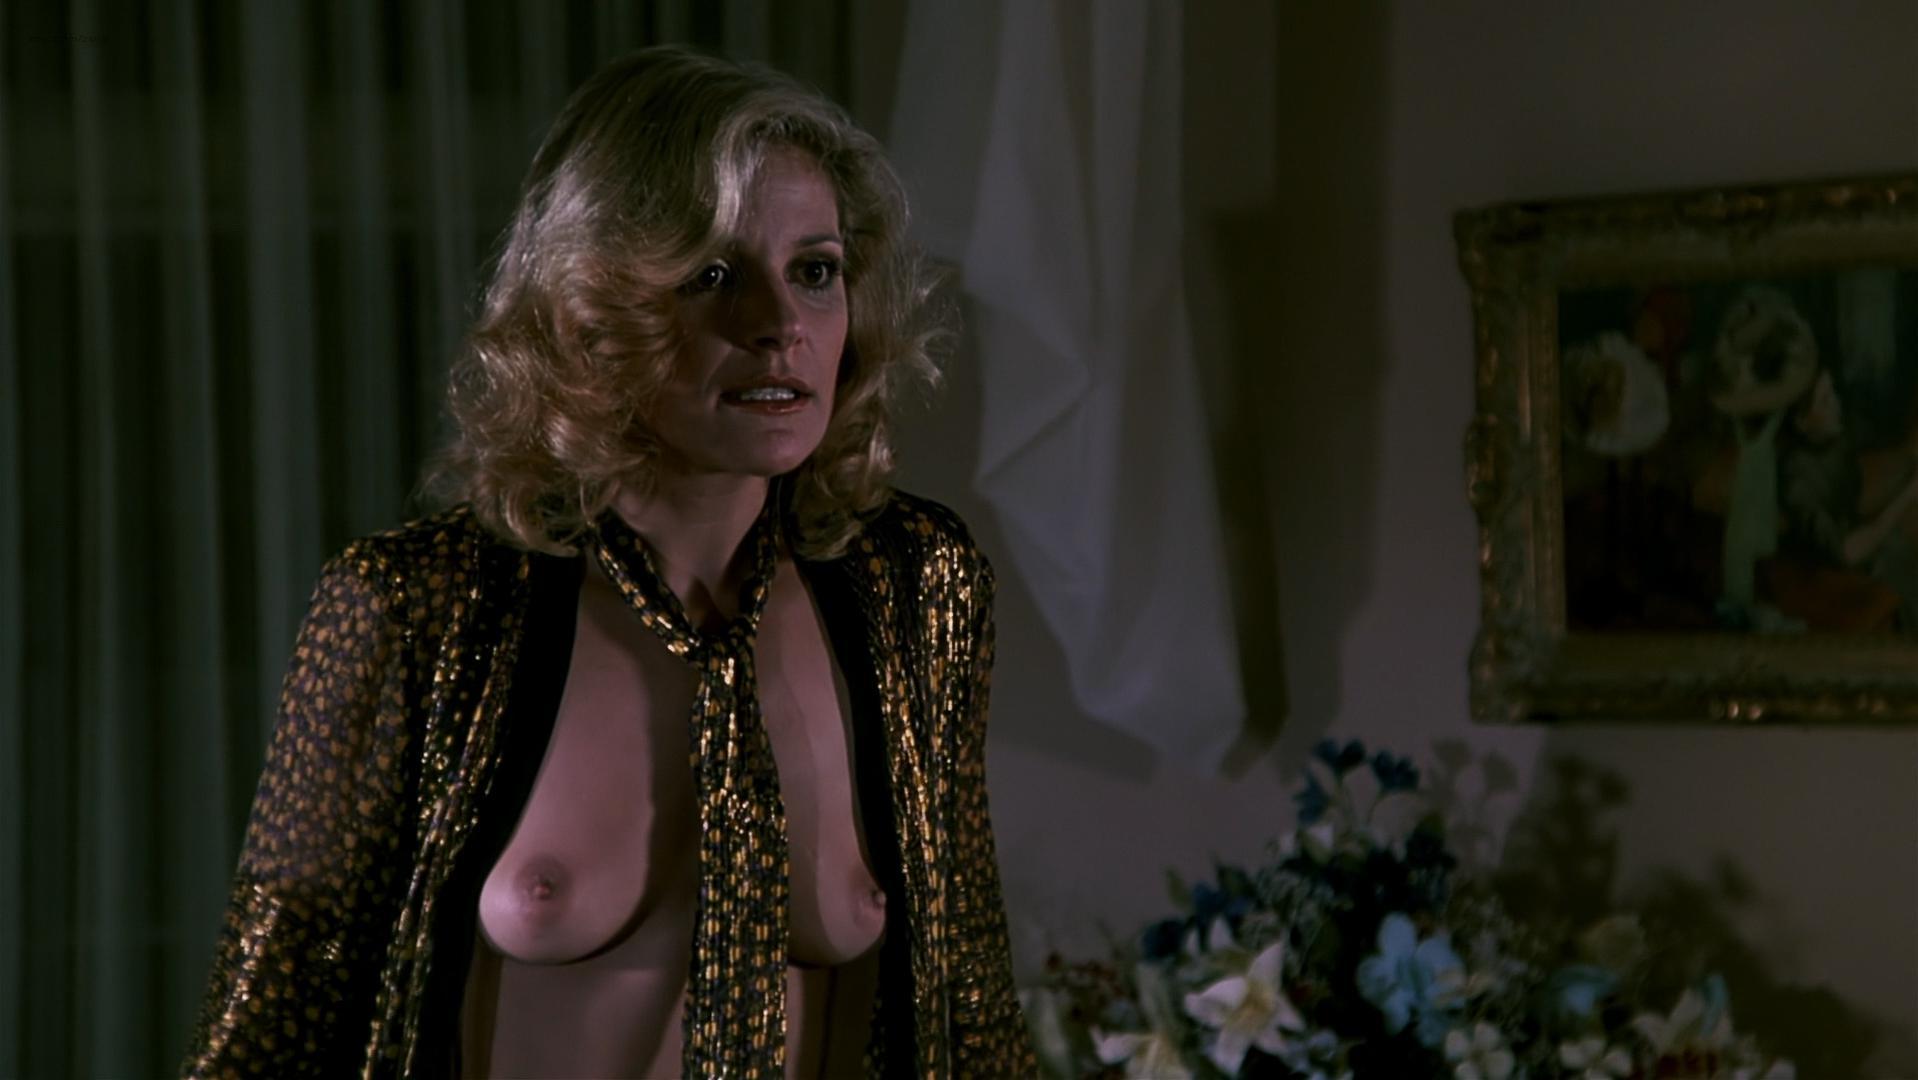 Helen Shaver nude, Cassie Yates nude, Merete Van Kamp nude, Meg Foster nude - The Osterman Weekend (1983)